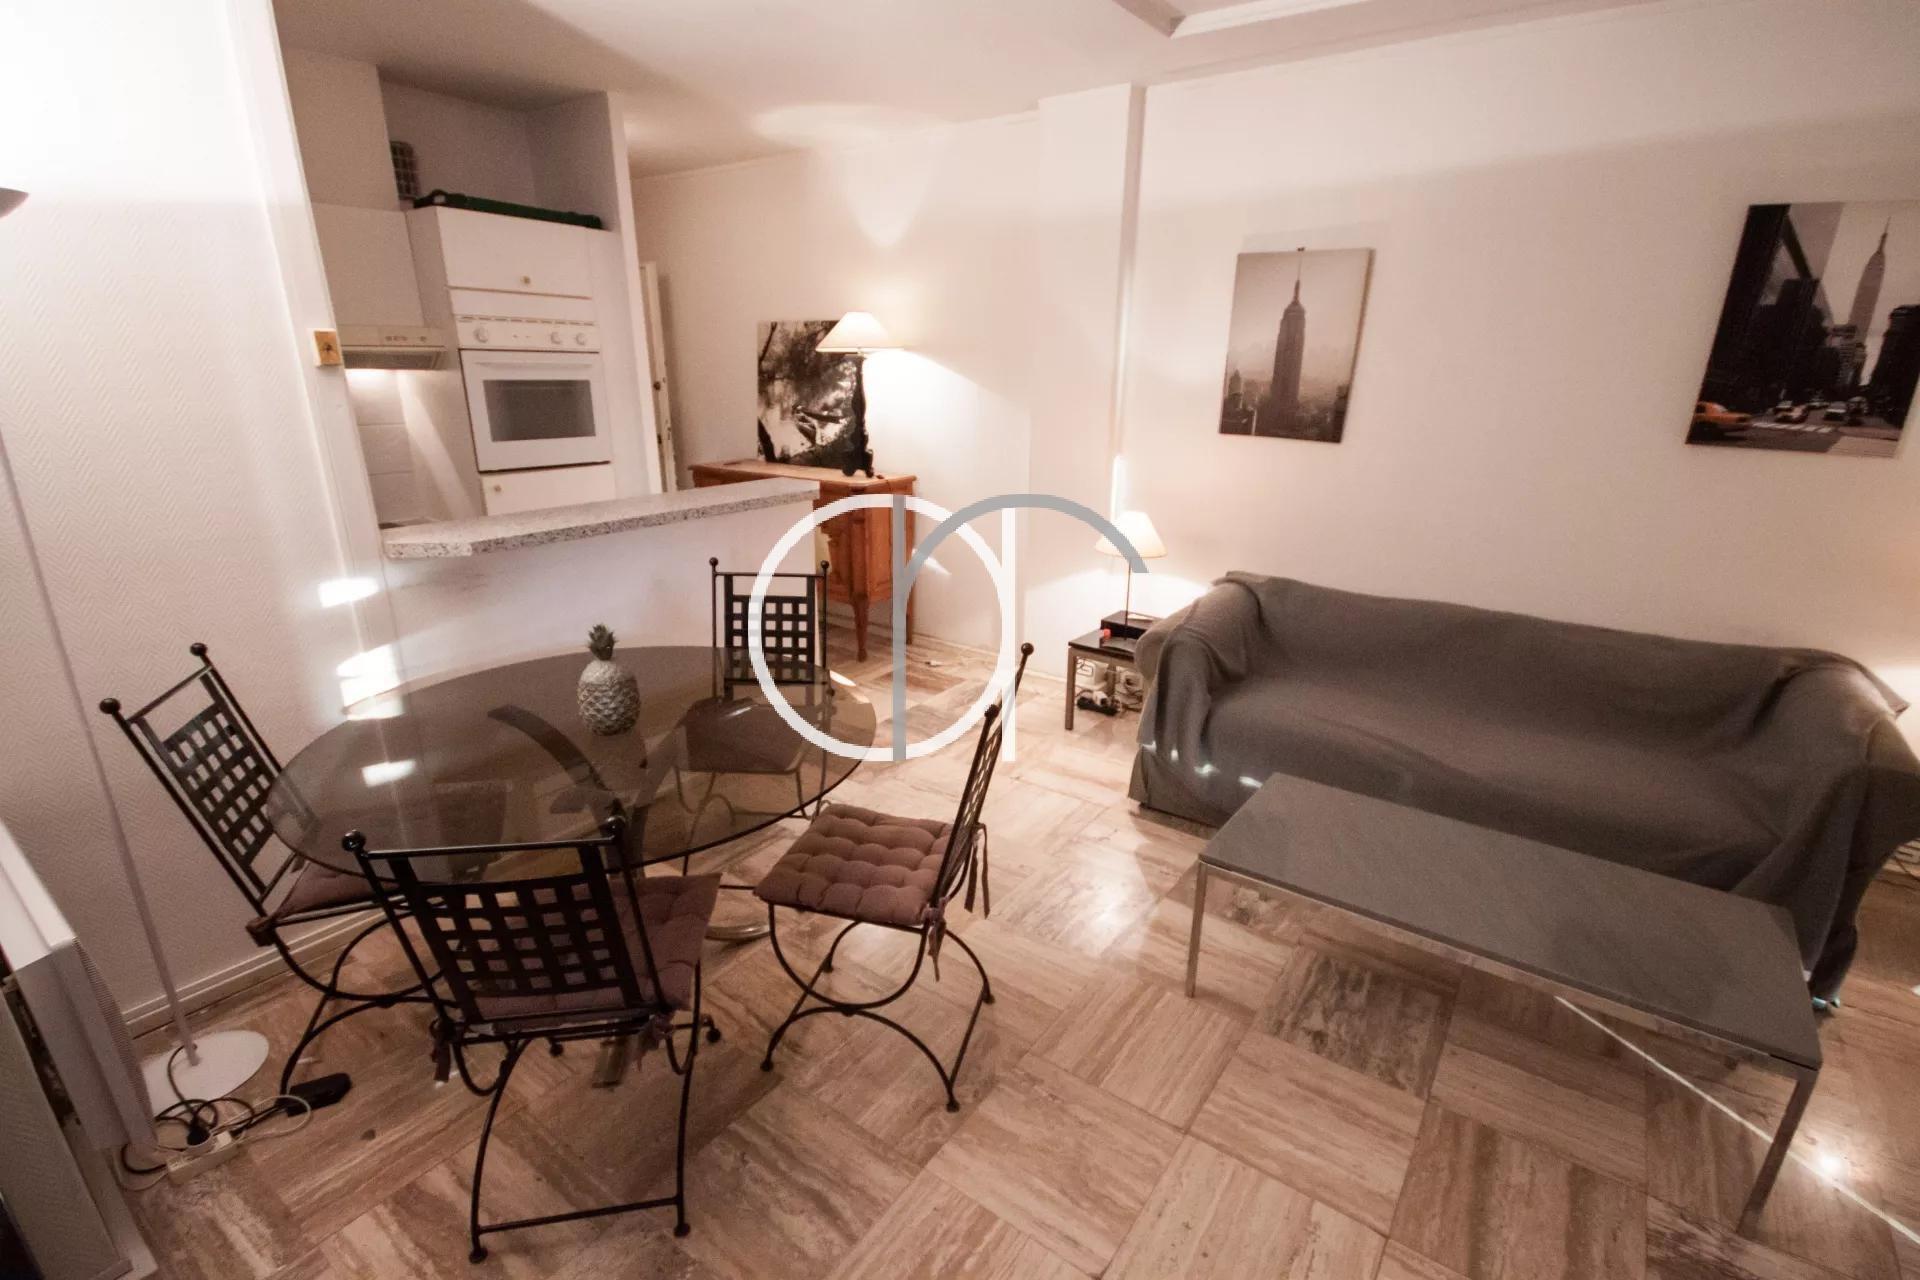 GRAND HOTEL - 1 BEDROOM SEA VIEW